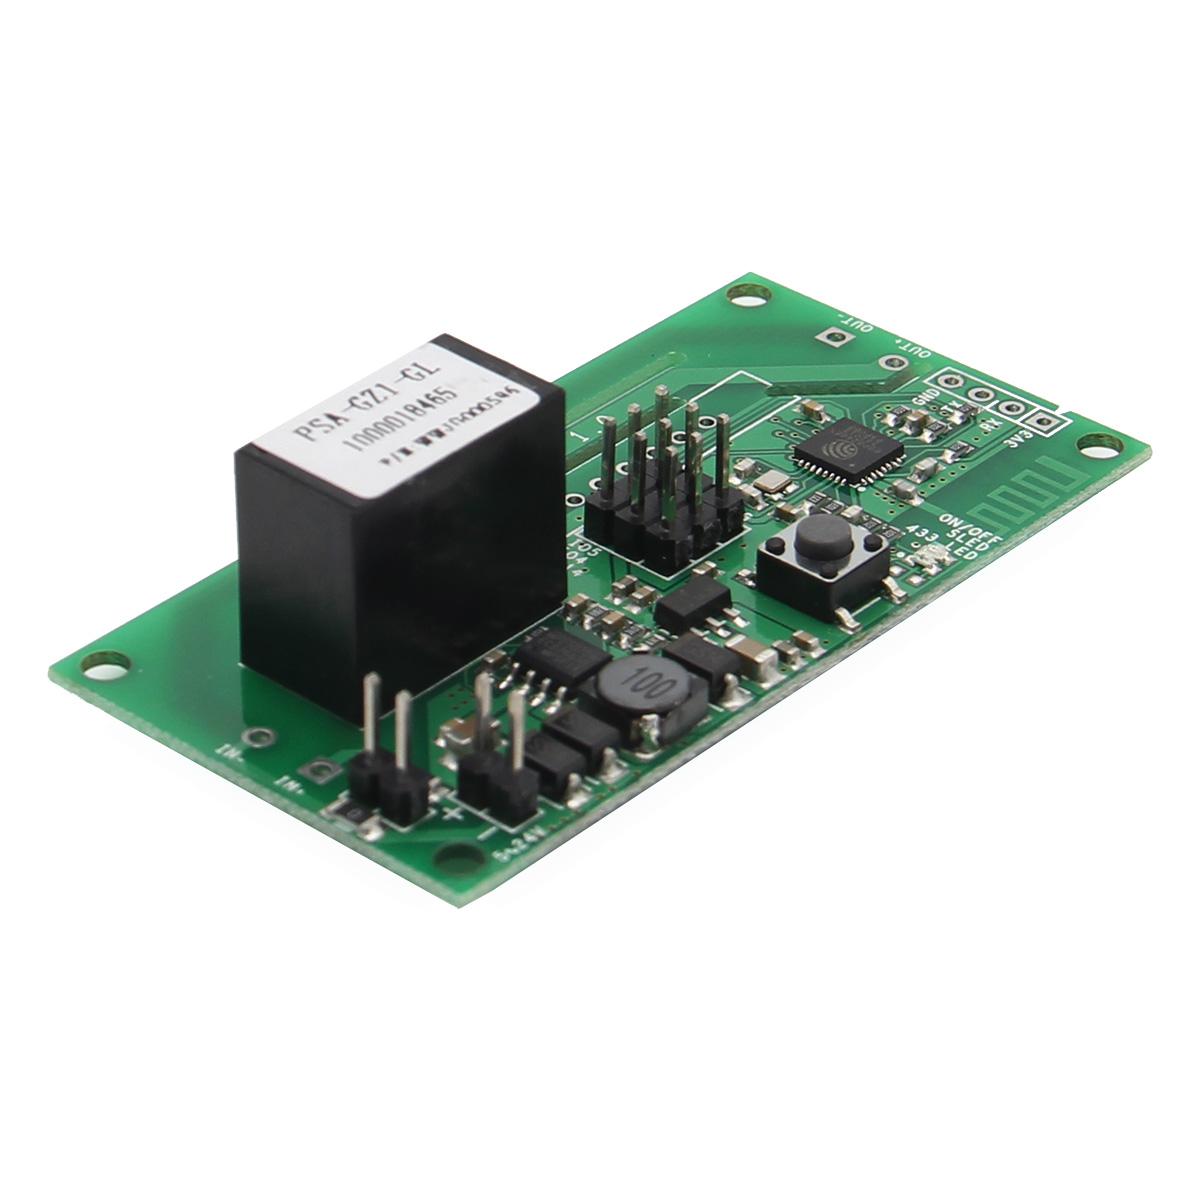 SONOFF® SV DC 5V-24V DIY WIFI Wireless Switch Socket SV Module APP Remote Control For Smart Home